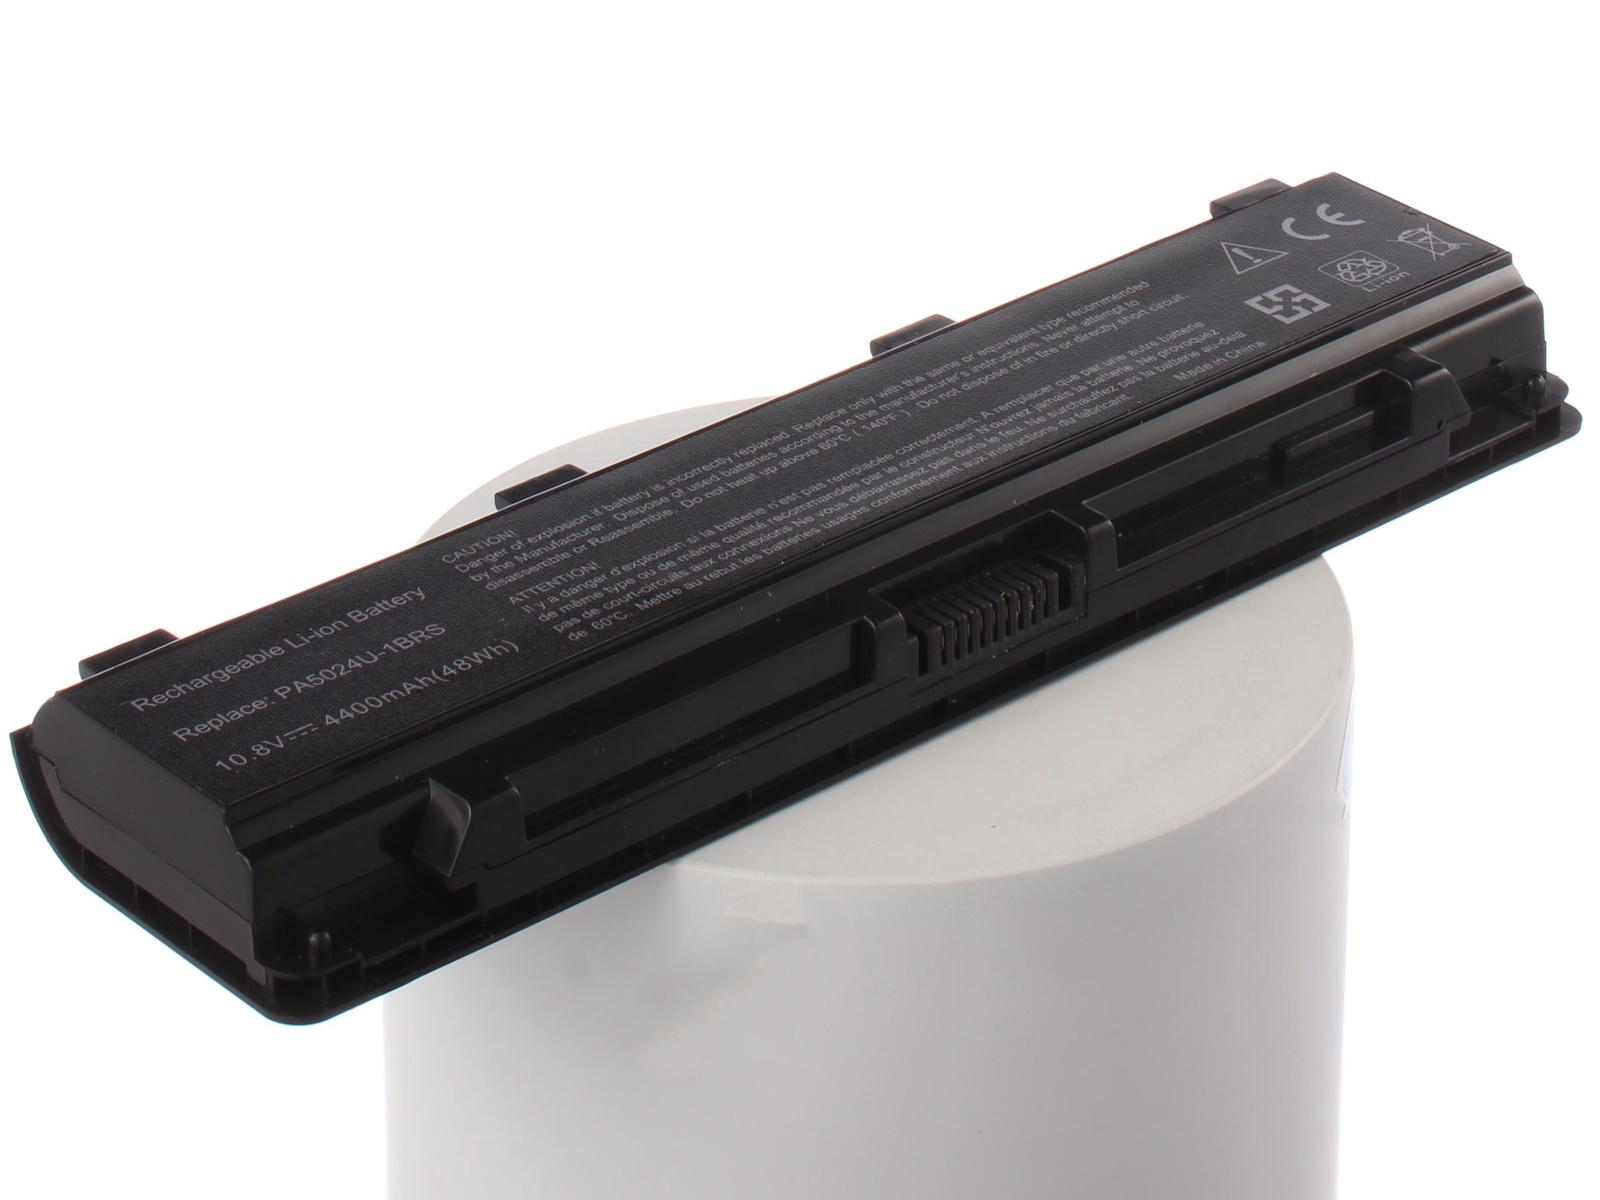 Аккумулятор для ноутбука AnyBatt для ToshiBa Satellite C870-BJK, Satellite L850-C9K, Satellite L855-B3M, Satellite L855D, P855-BLS, Satellite C850D-C3W, Satellite C870-D5W, Satellite C850-C2K, Satellite C850D-C4S ноутбук toshiba satellite c850